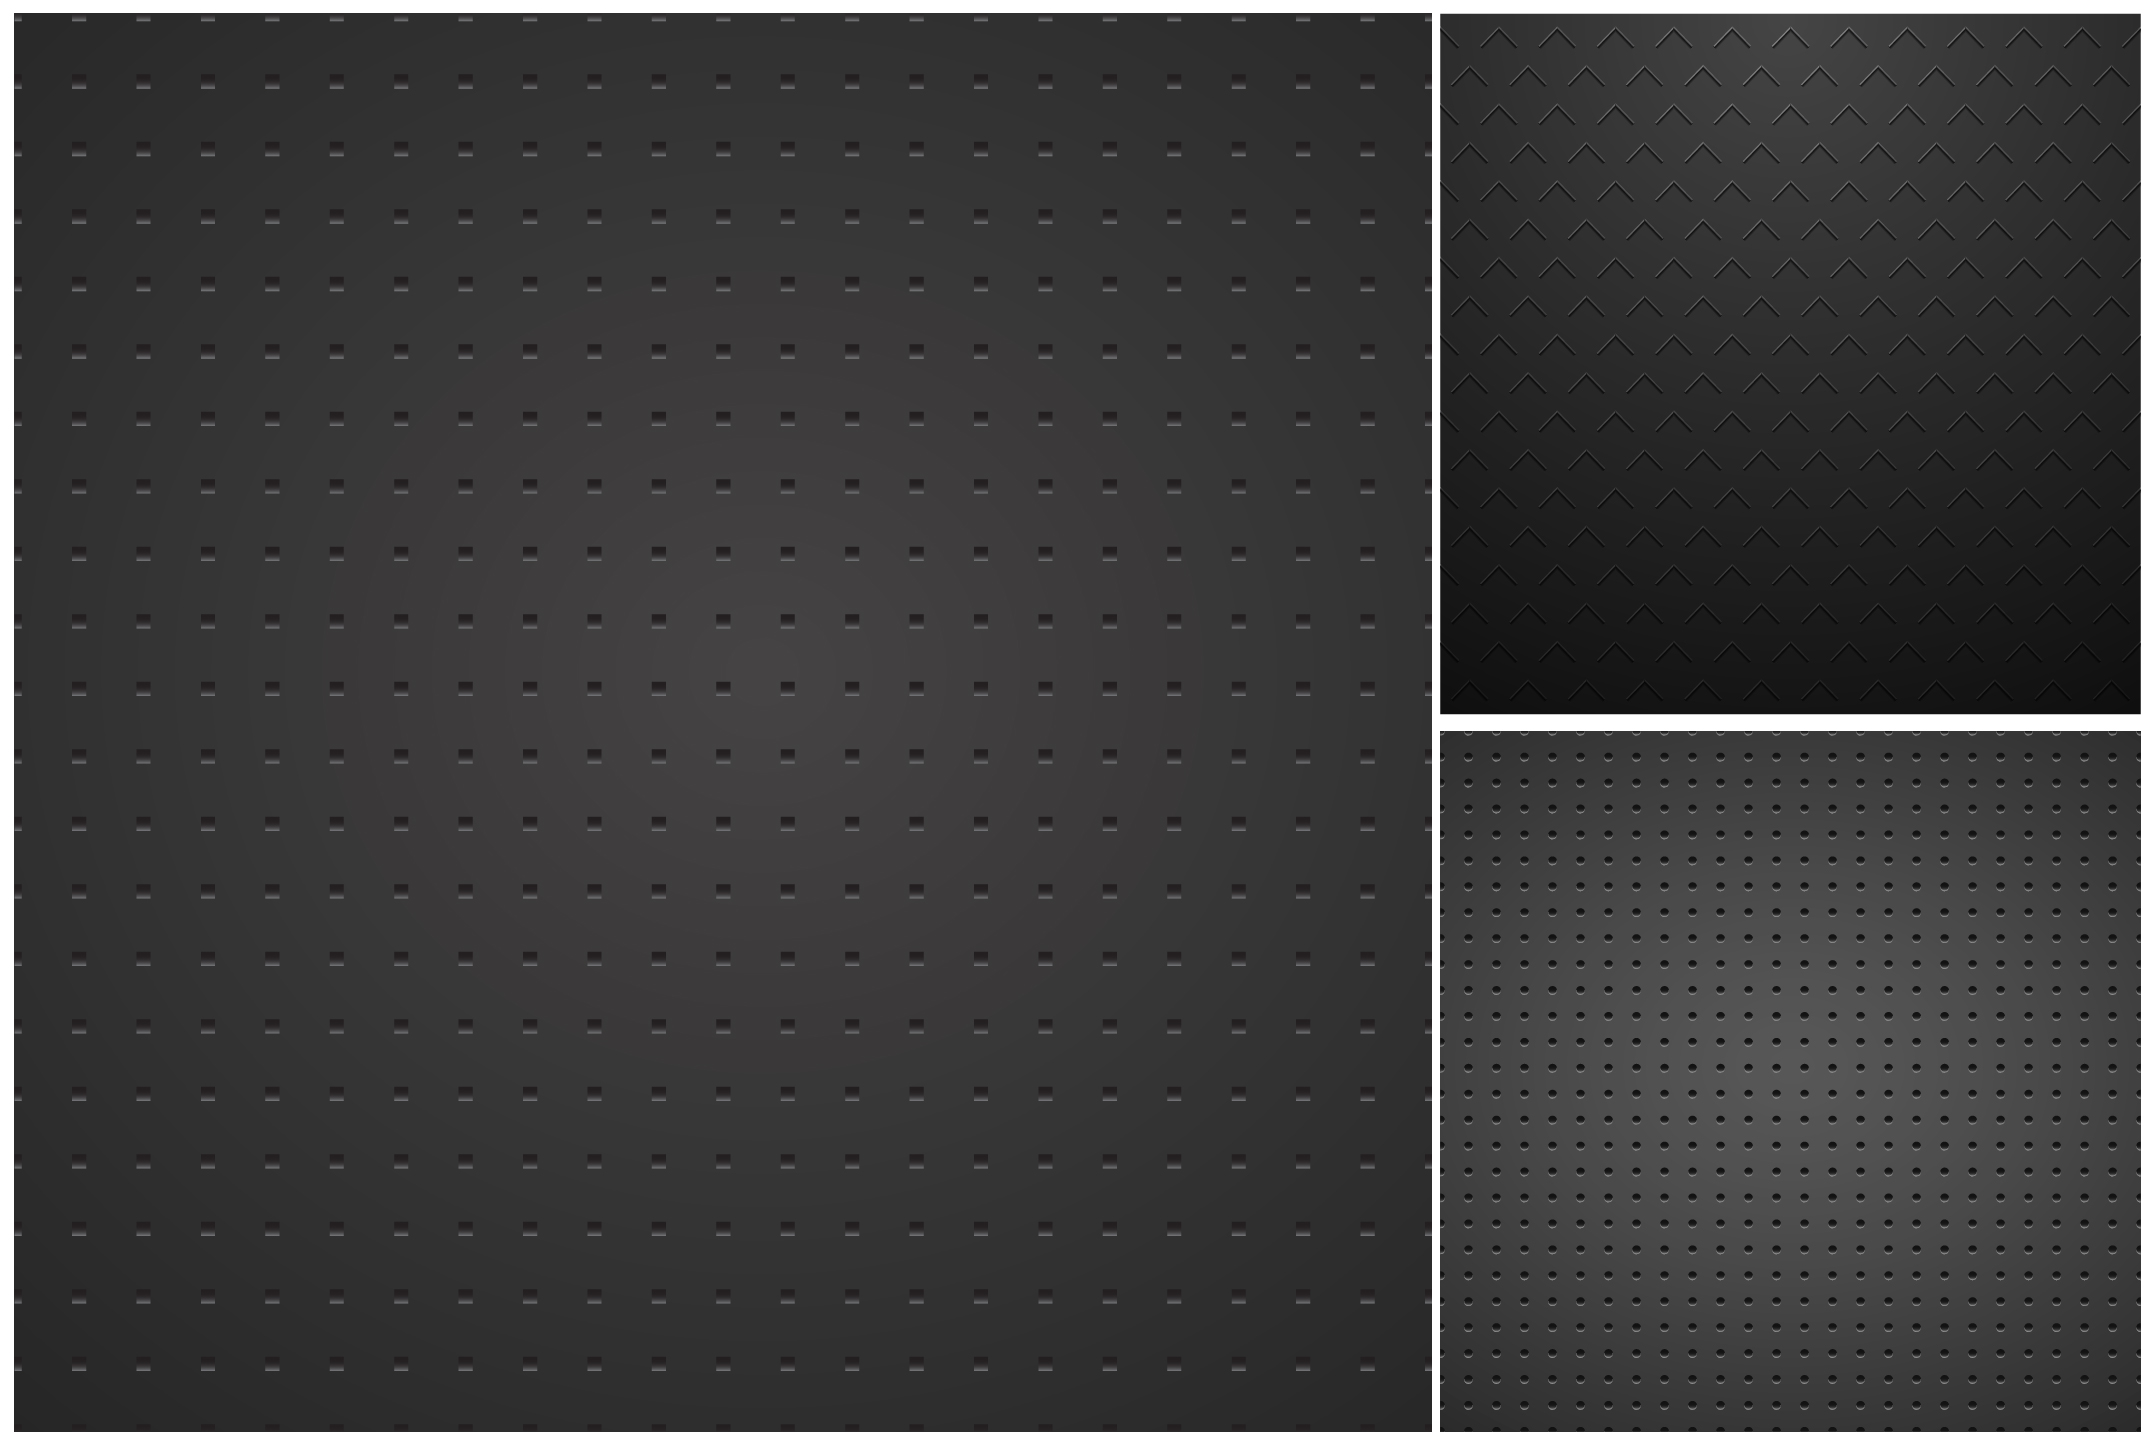 Metallic dark textures with holes. example image 4